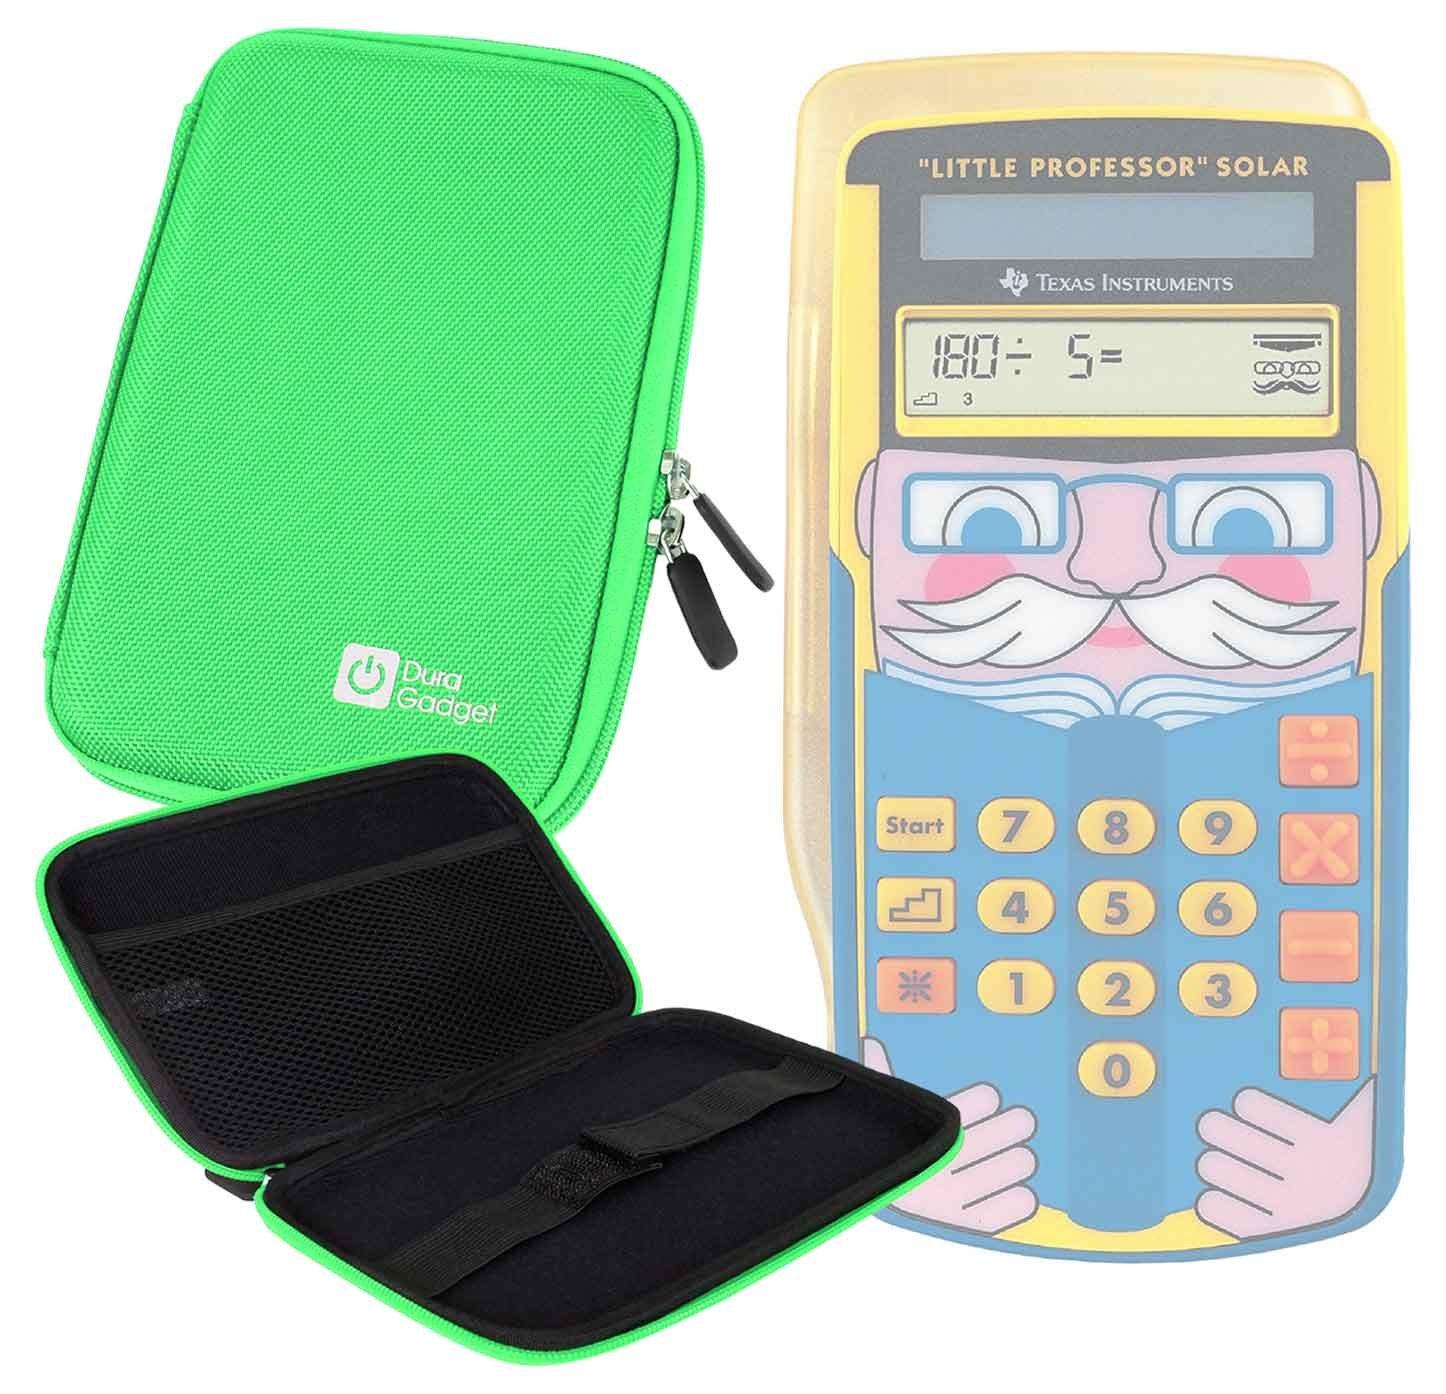 DURAGADGET Green Hard Portable EVA Case With Zipper for the Texas Instruments Little Professor Solar